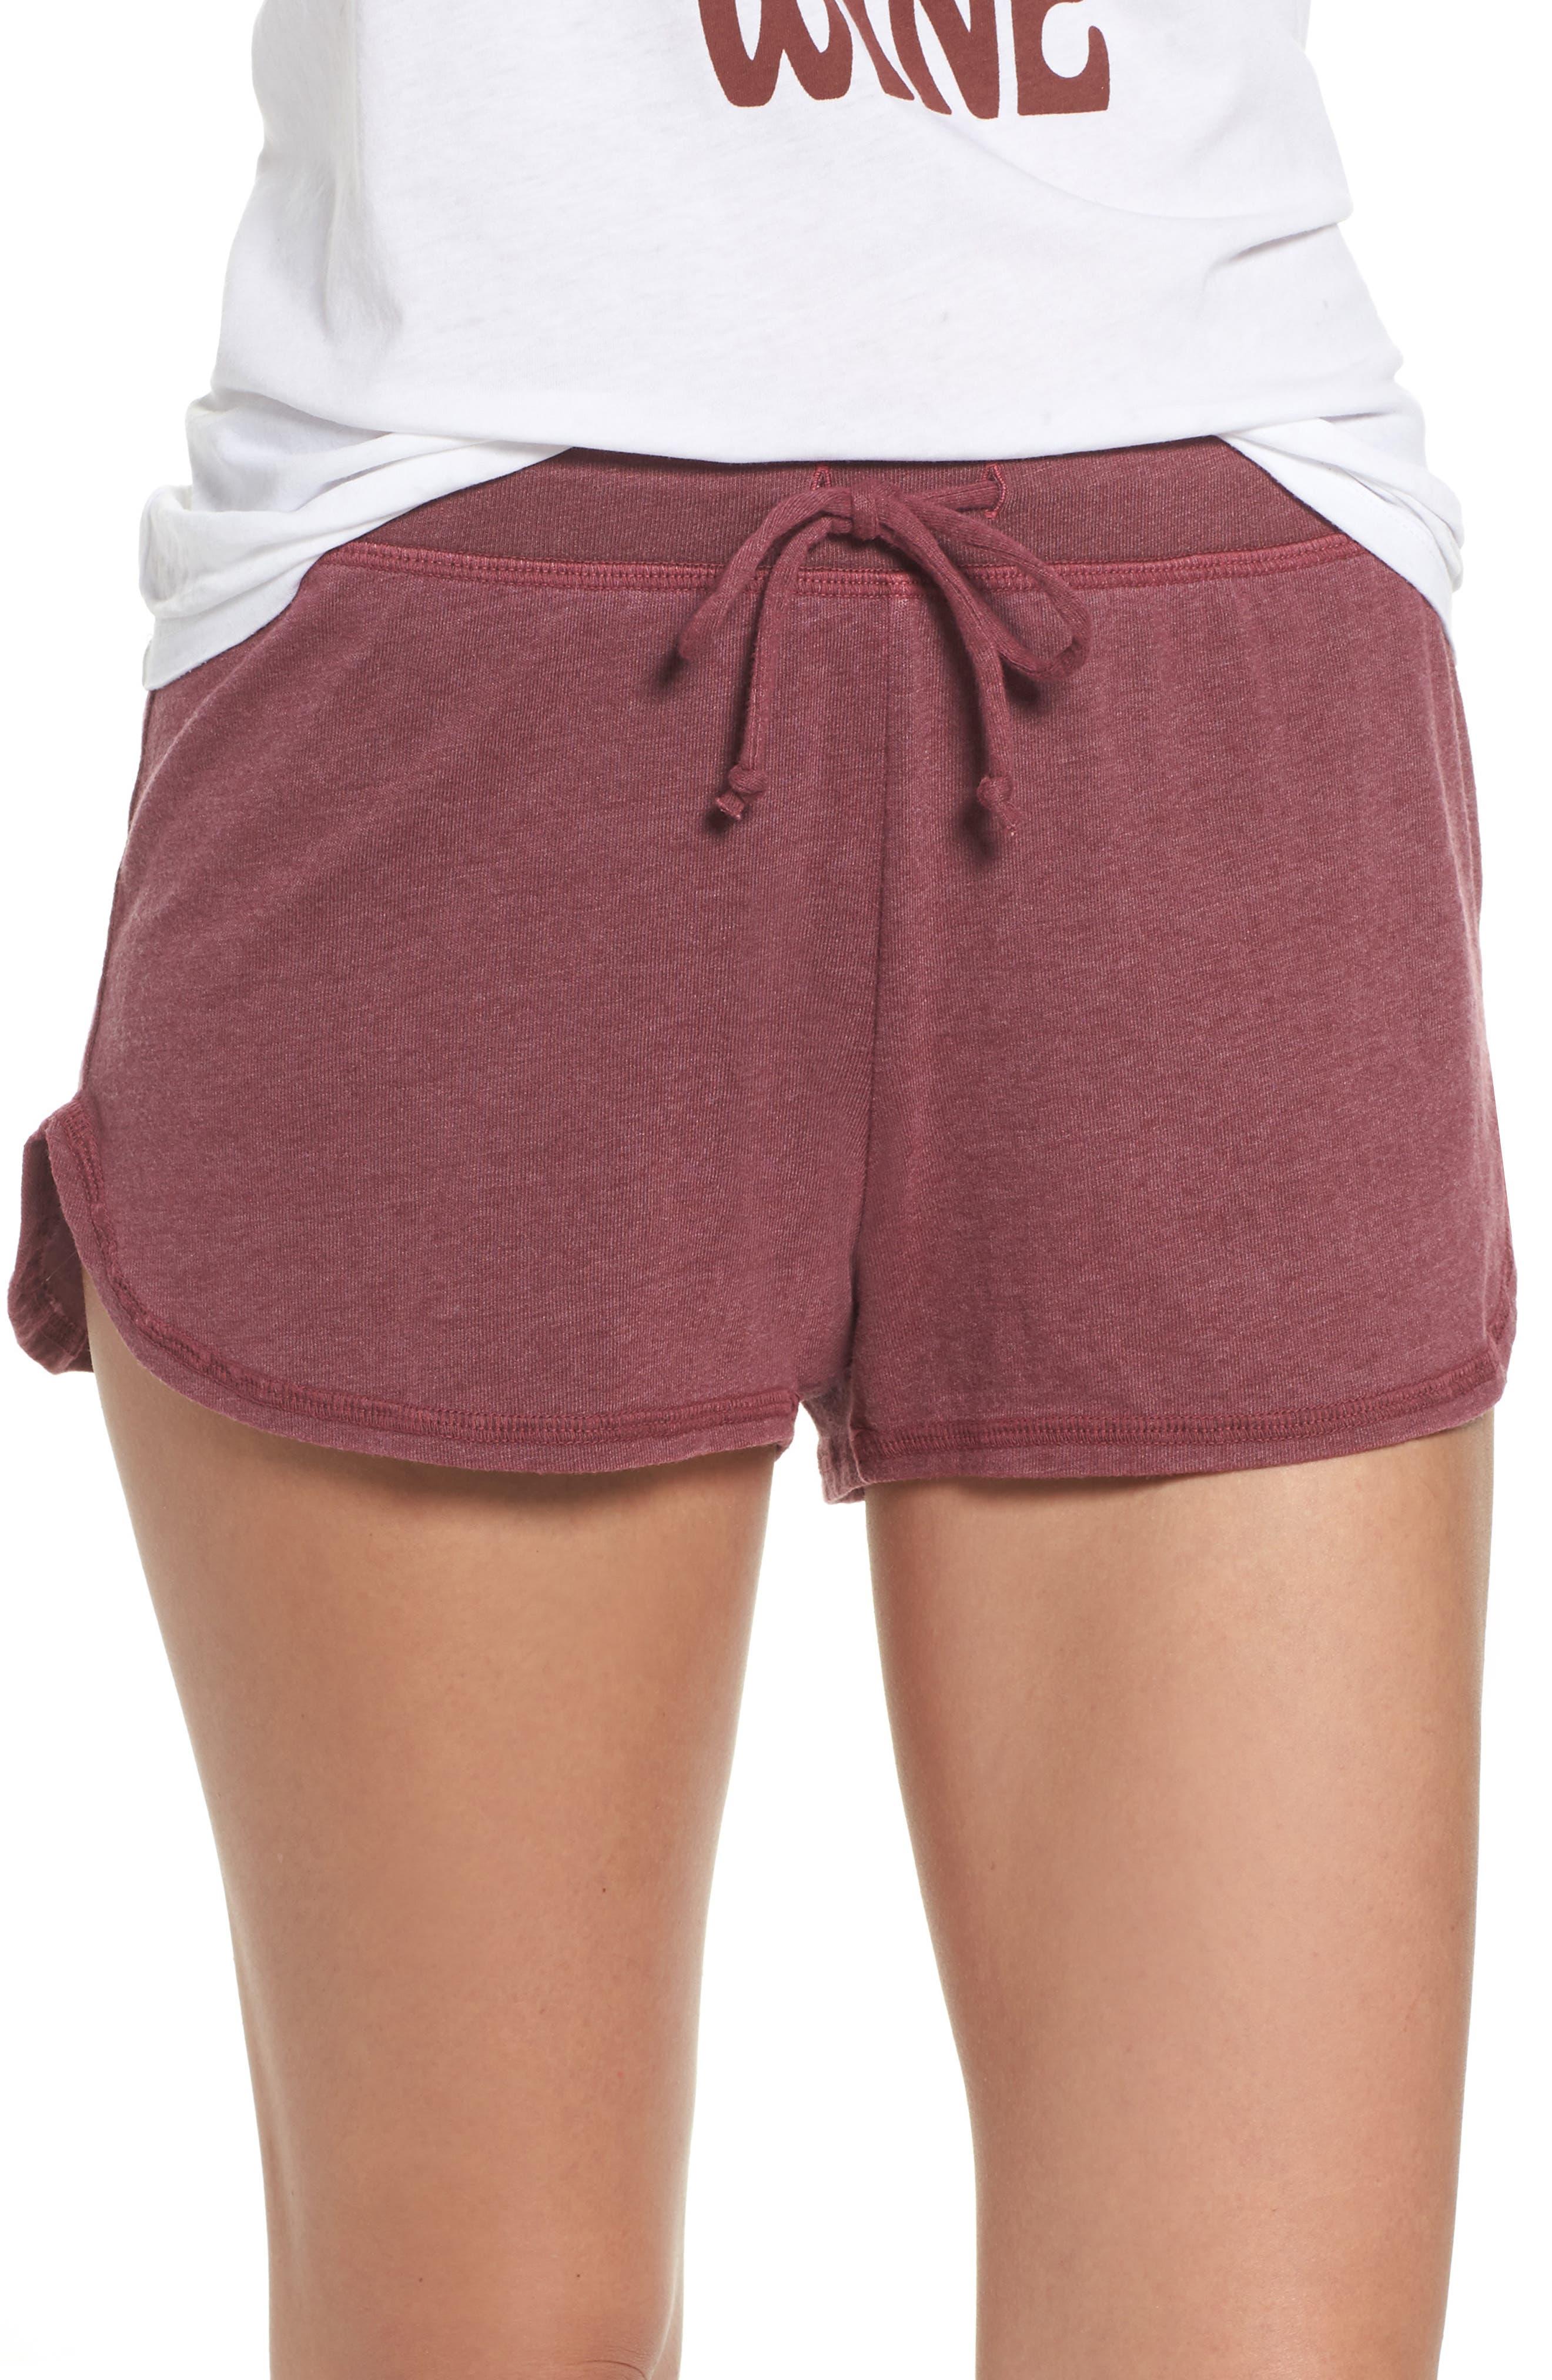 Dreamer Lounge Shorts,                         Main,                         color, Saint